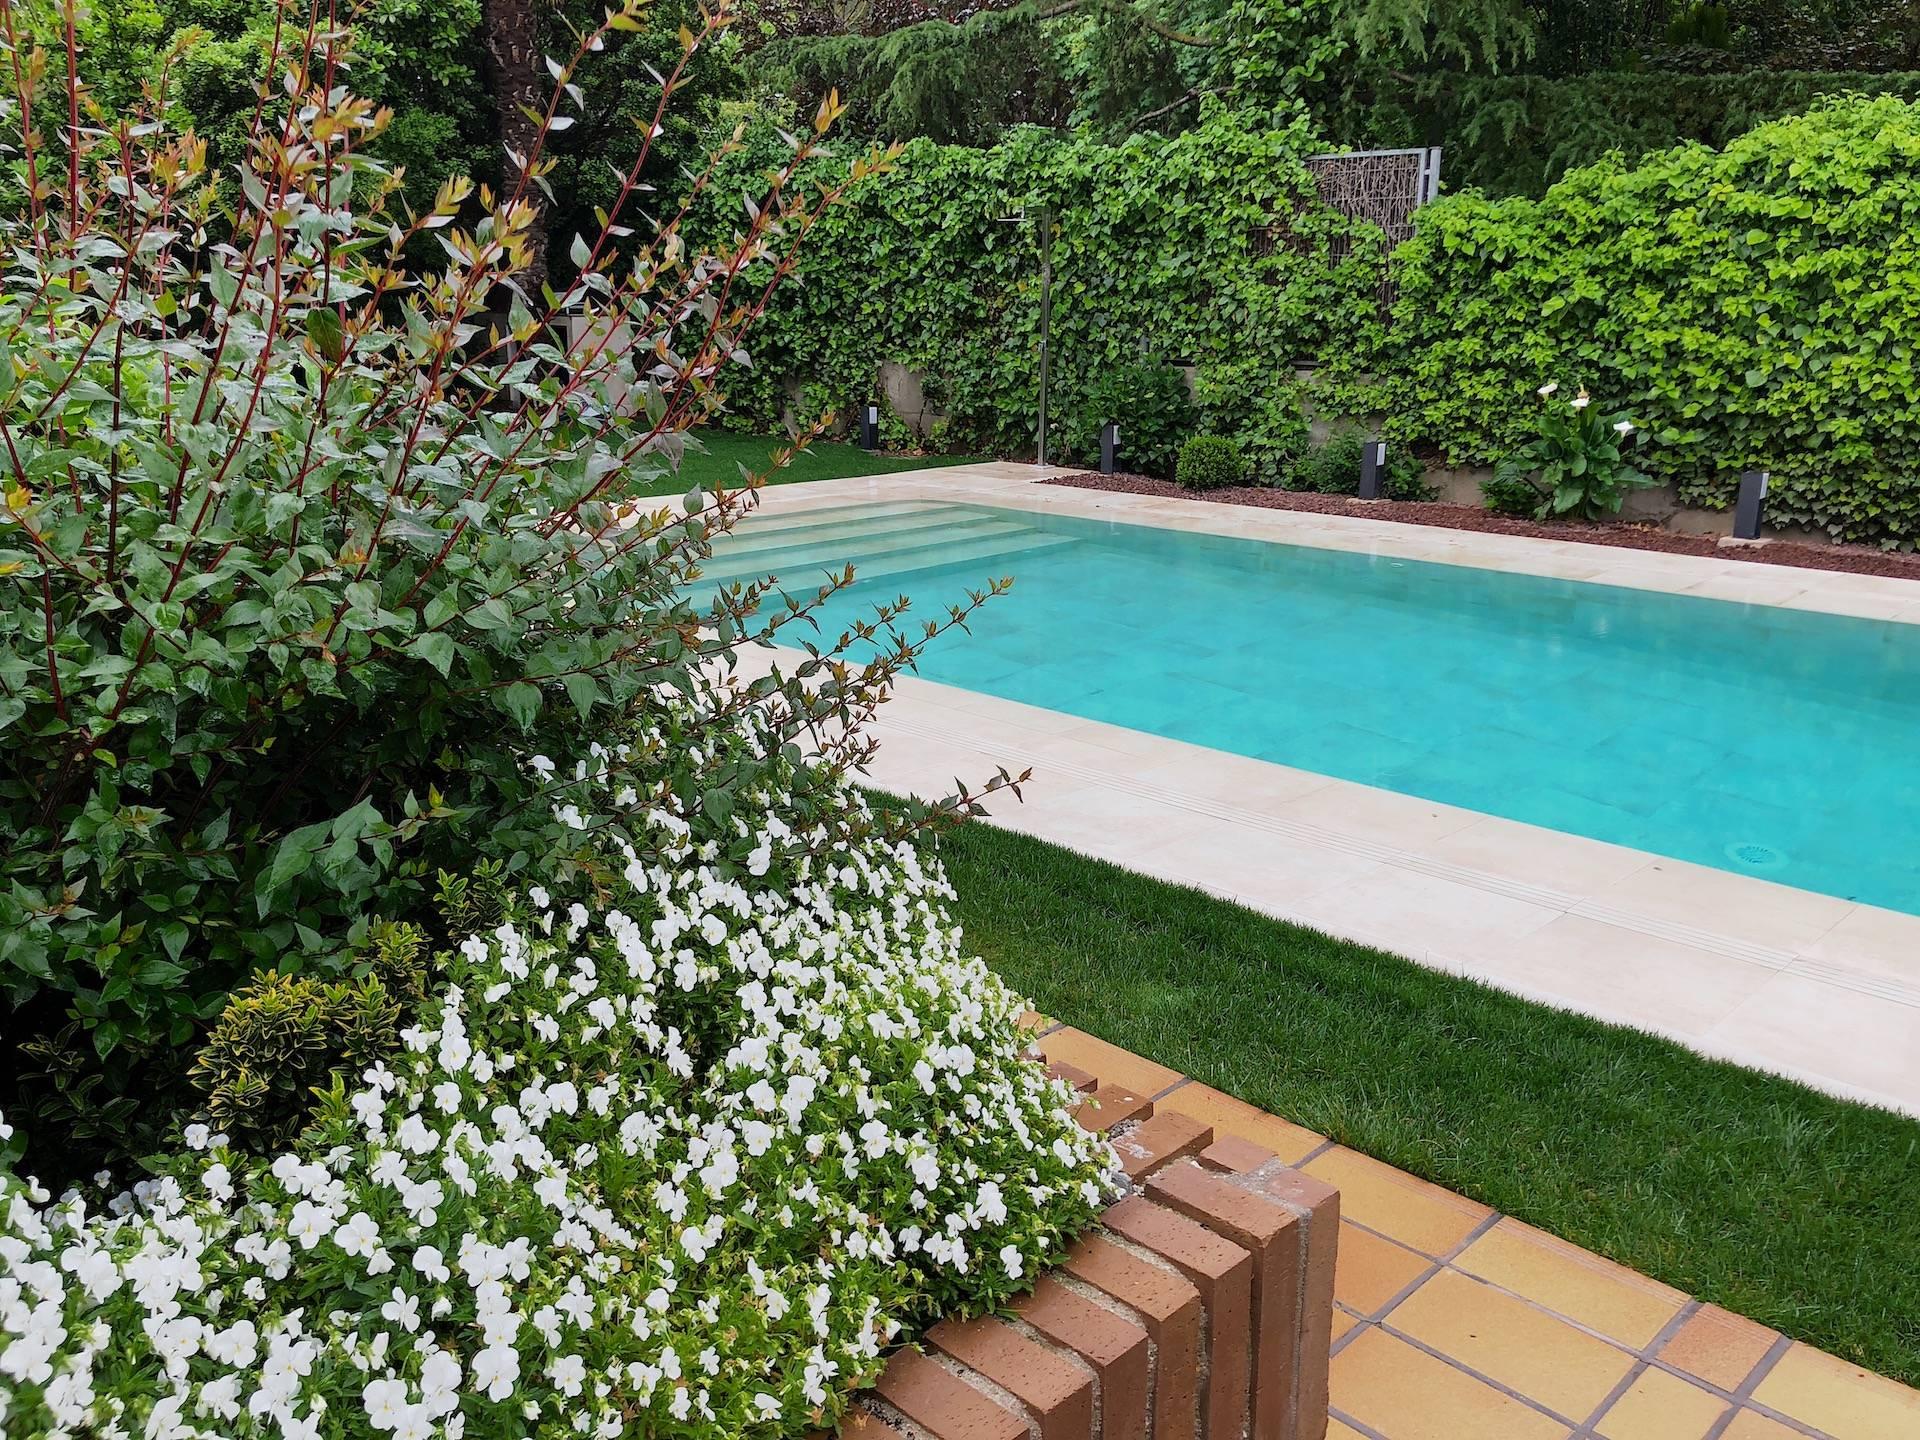 Jardín con piscina desbordante reformada